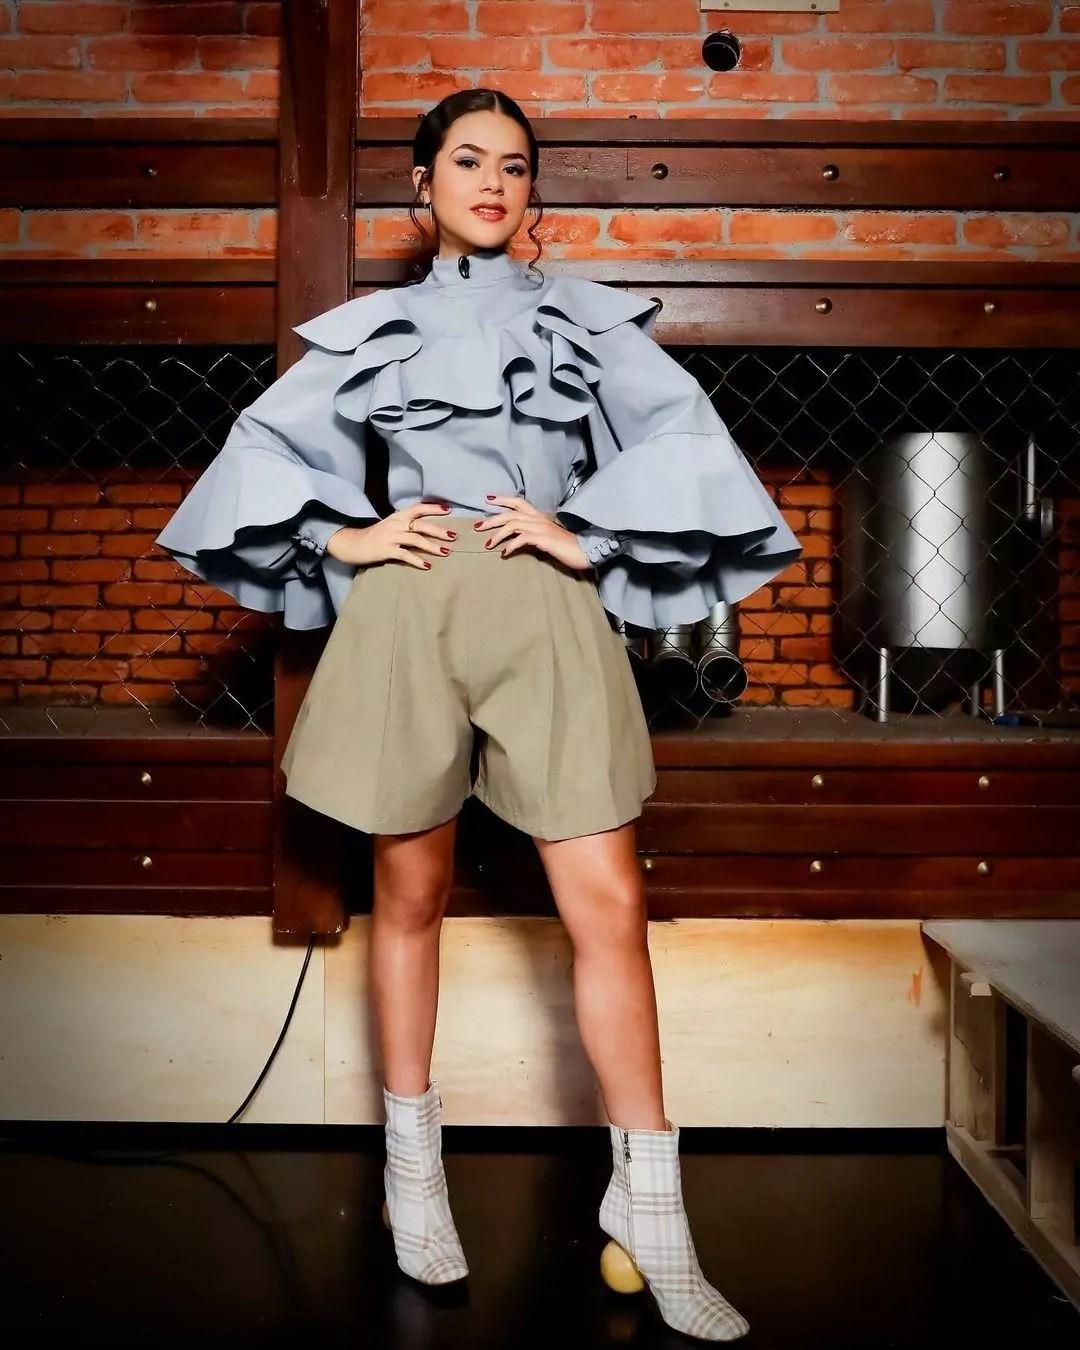 Imagem mostra Maisa com roupa volumosa